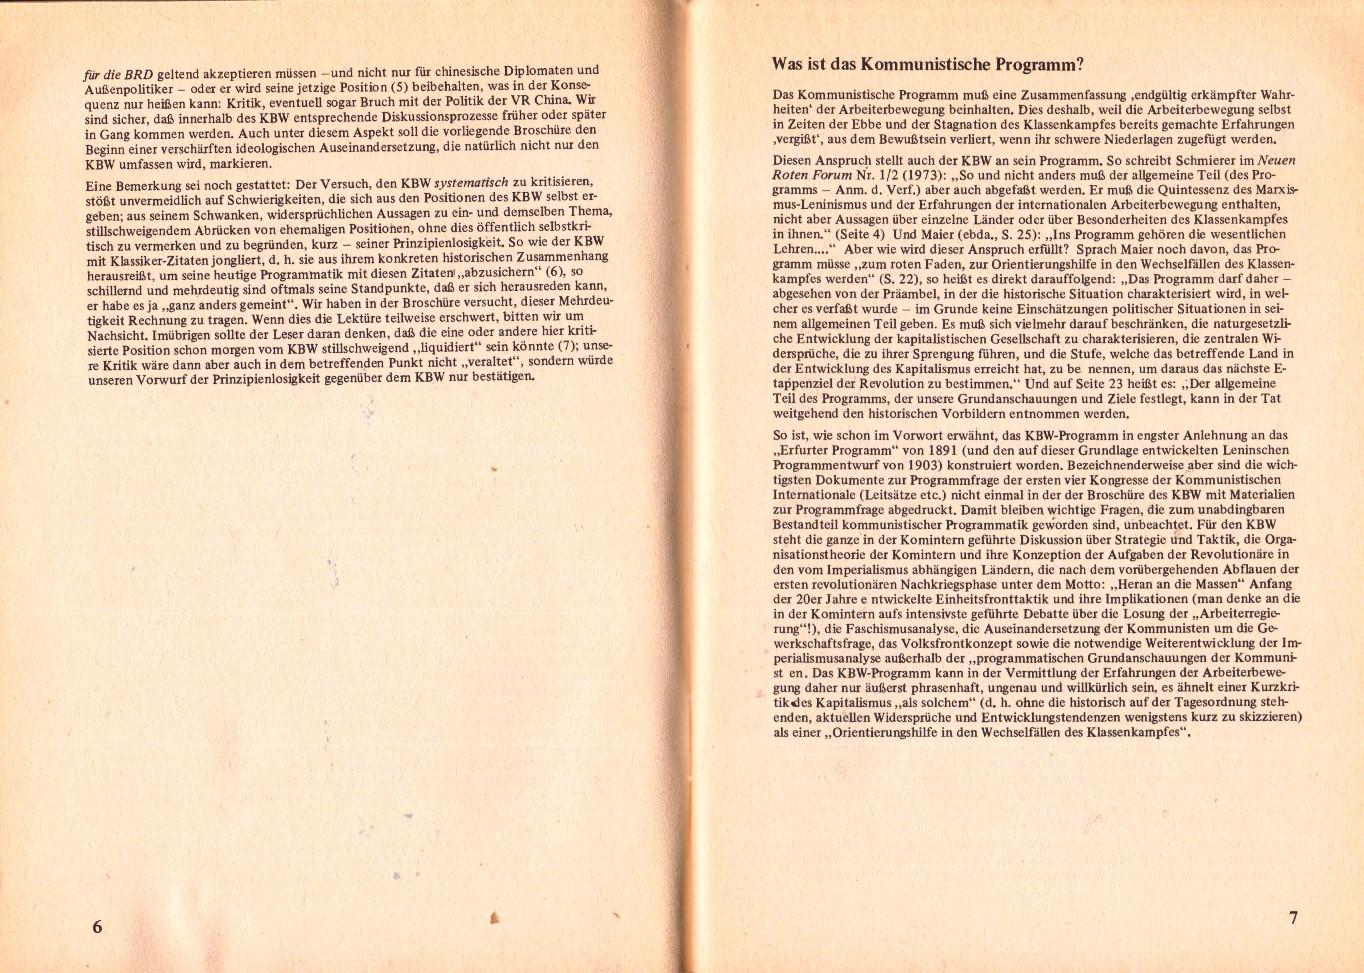 Spartacus_1975_Kritik_des_KBW_05